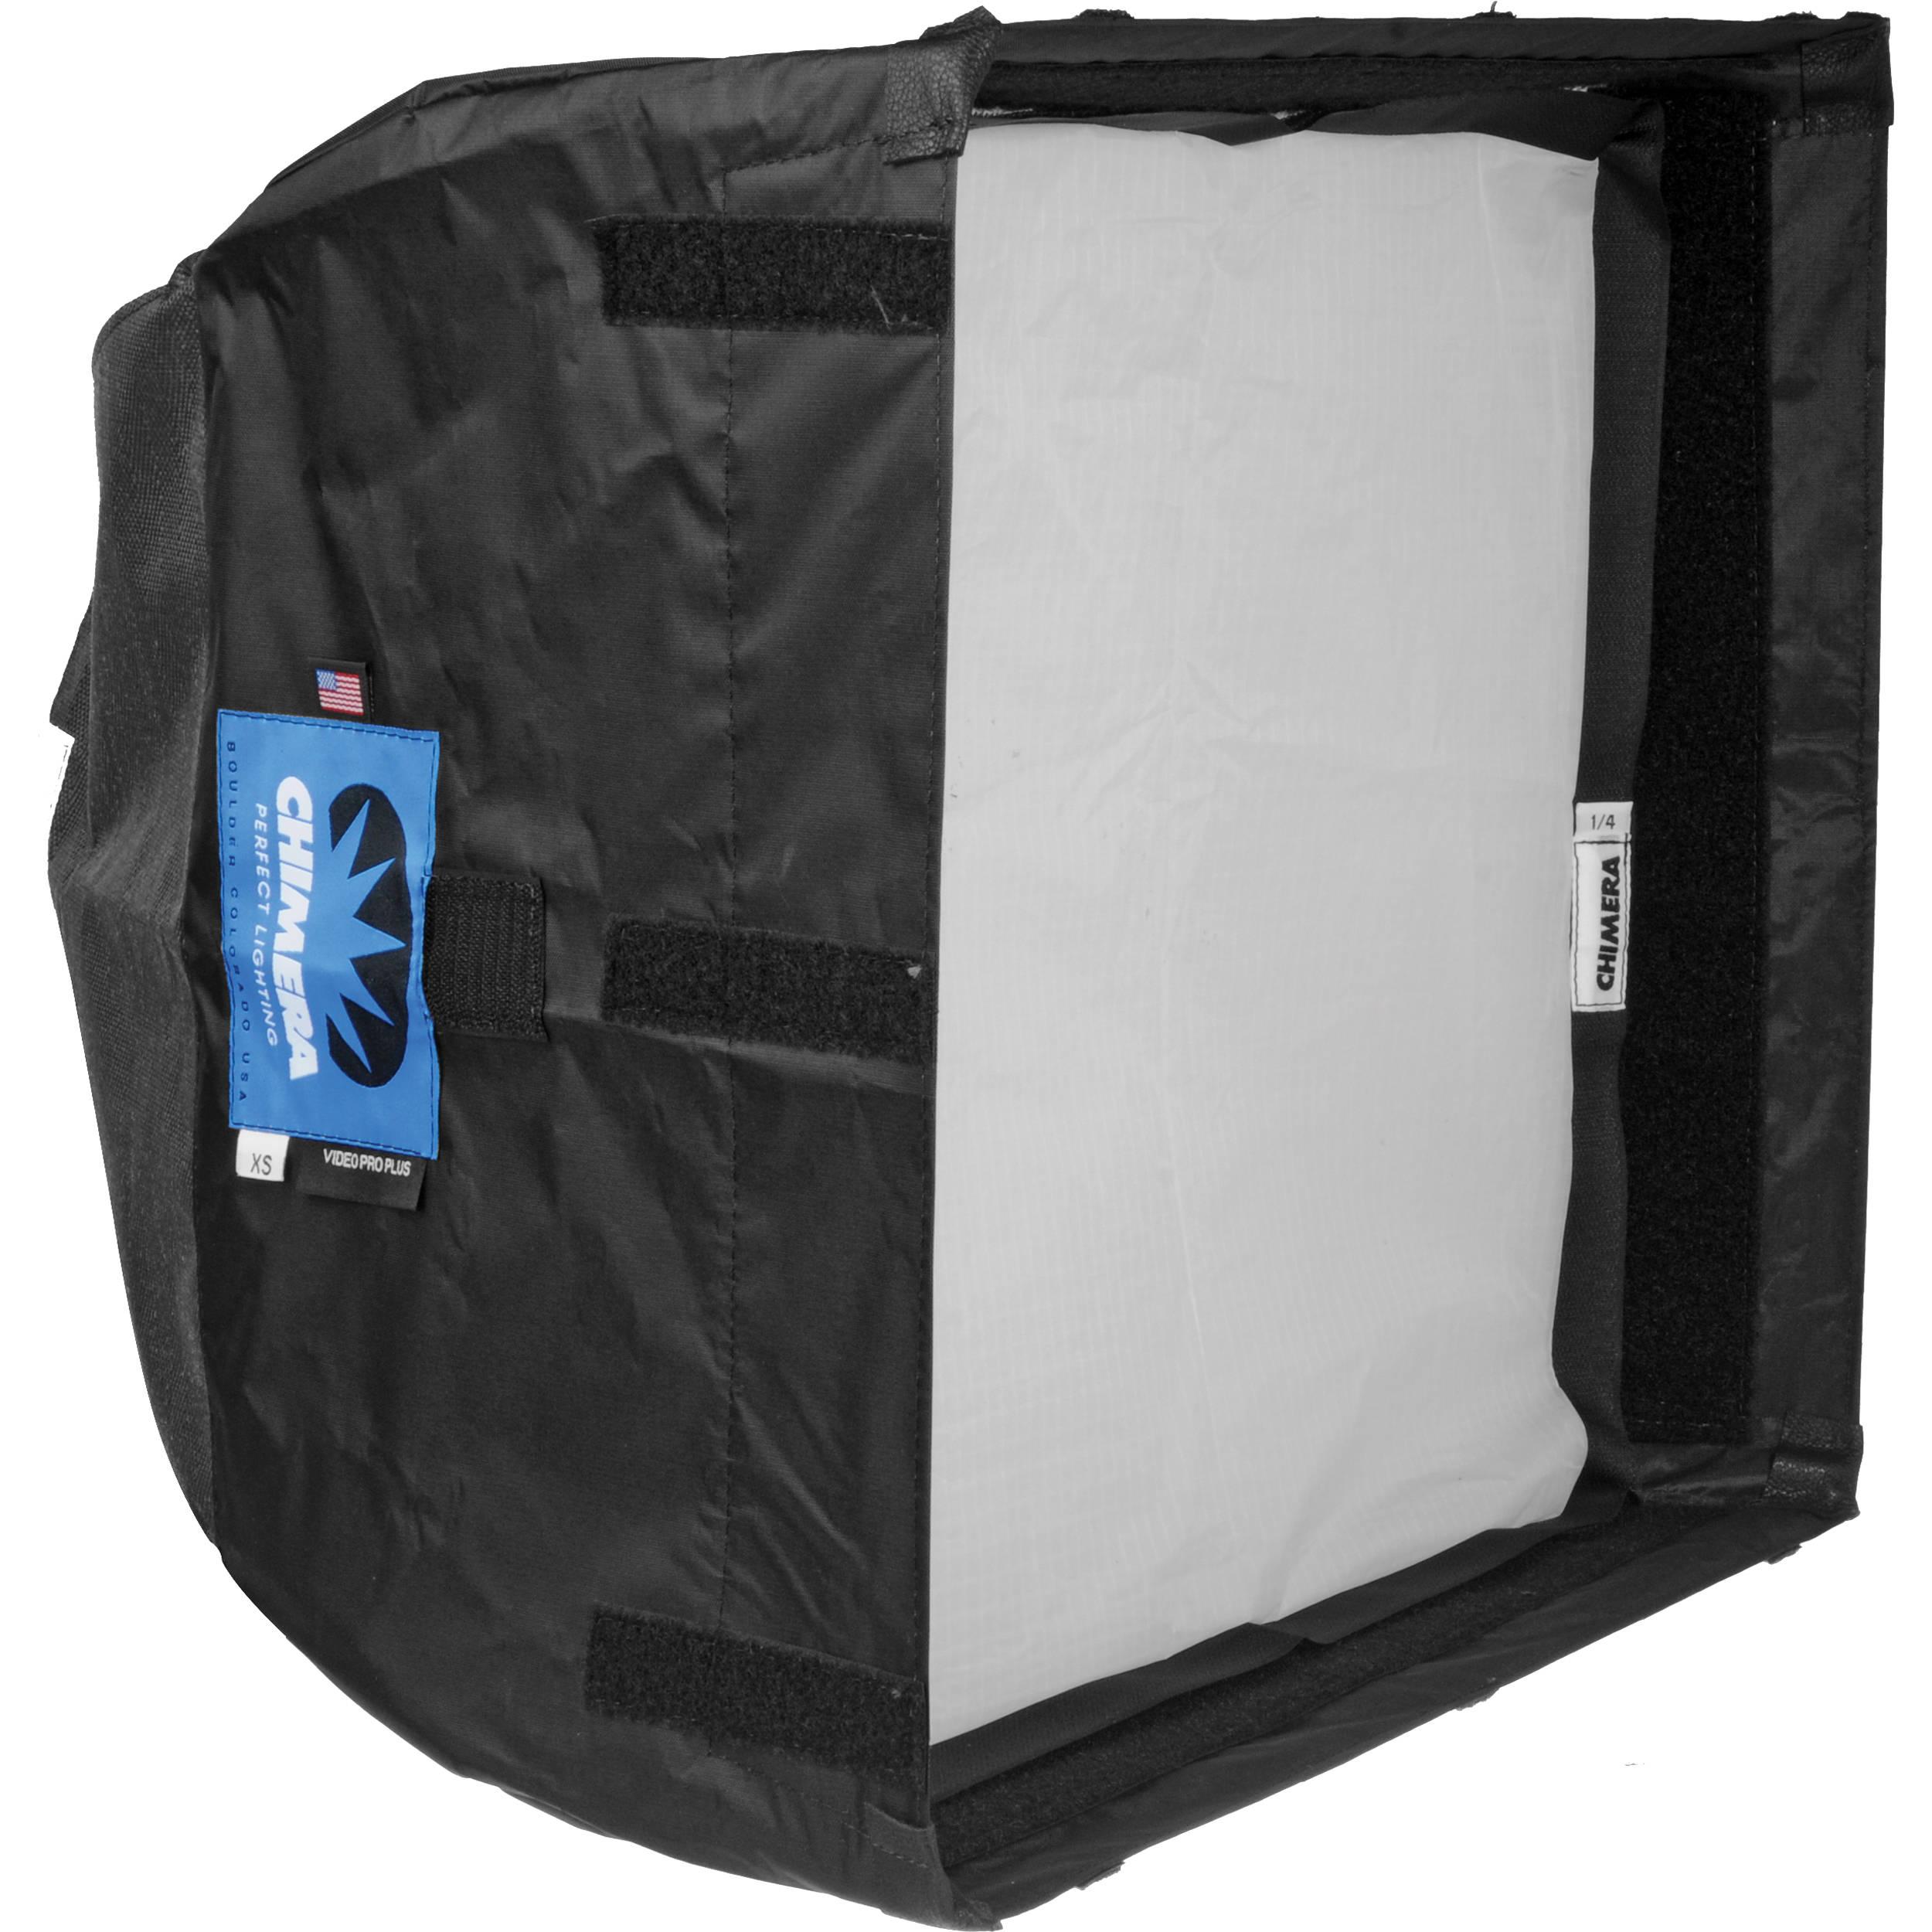 Chimera Video Pro Plus Softbox - X-Small  sc 1 st  Bu0026H & Chimera Video Pro Plus Softbox - X-Small 8115 Bu0026H Photo Video azcodes.com